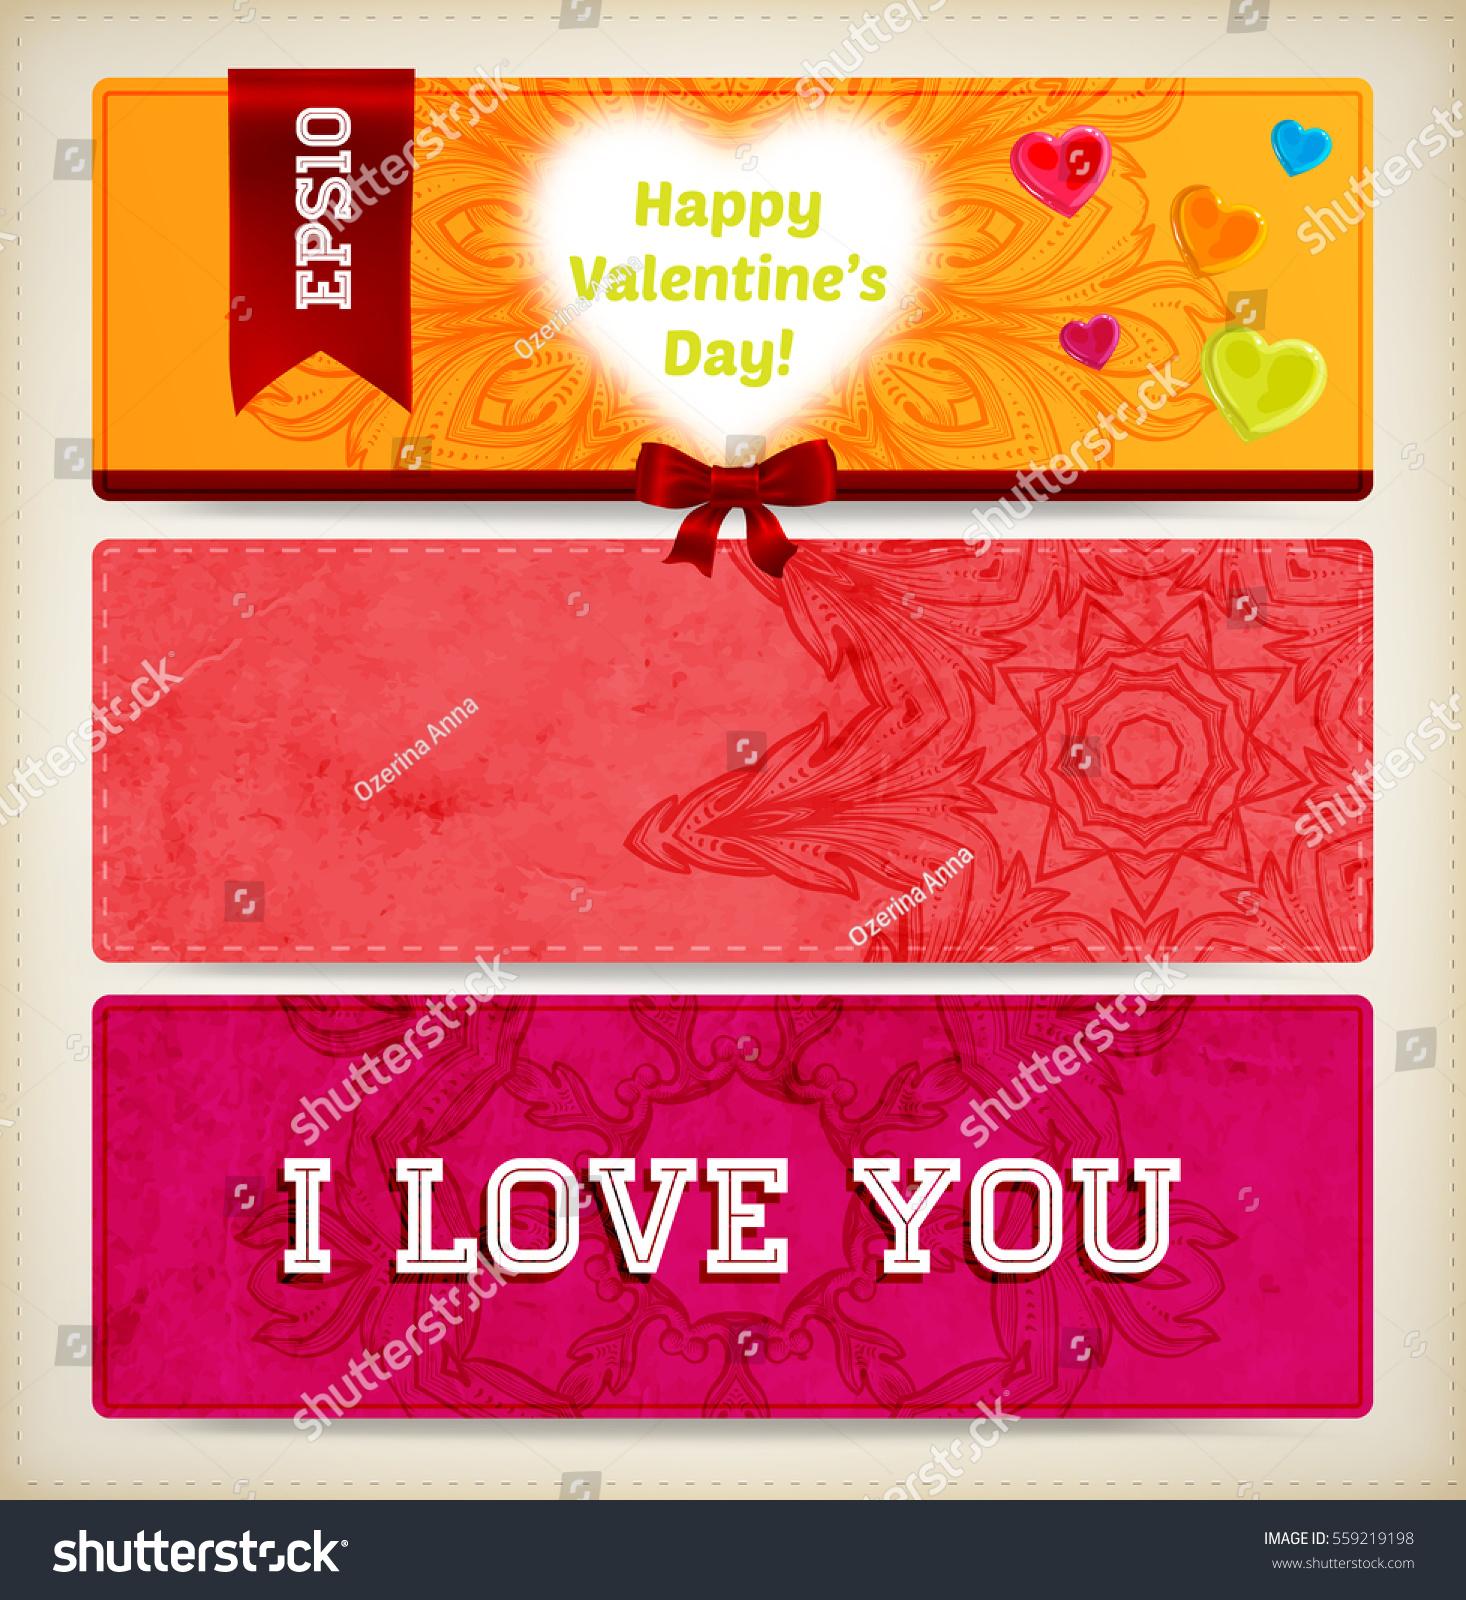 Wedding Invitation Card Valentines Day Designs Stock Vector HD ...